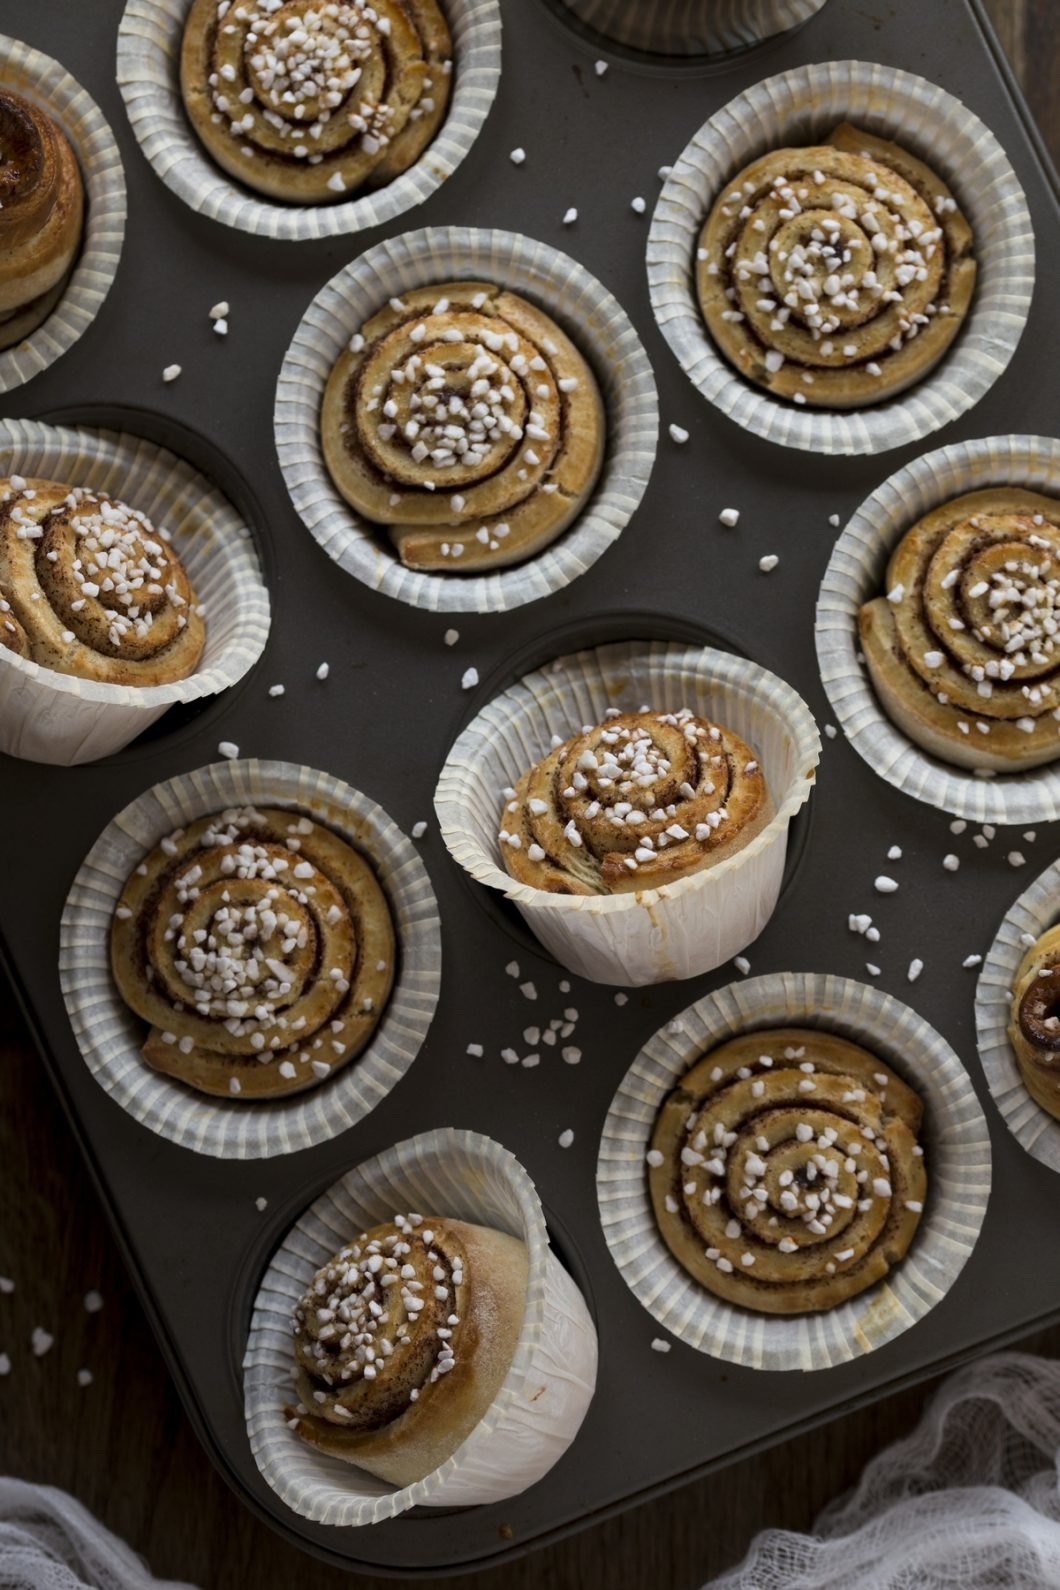 Miniature muffin tin kanelbulle buns baked in a muffin tin.